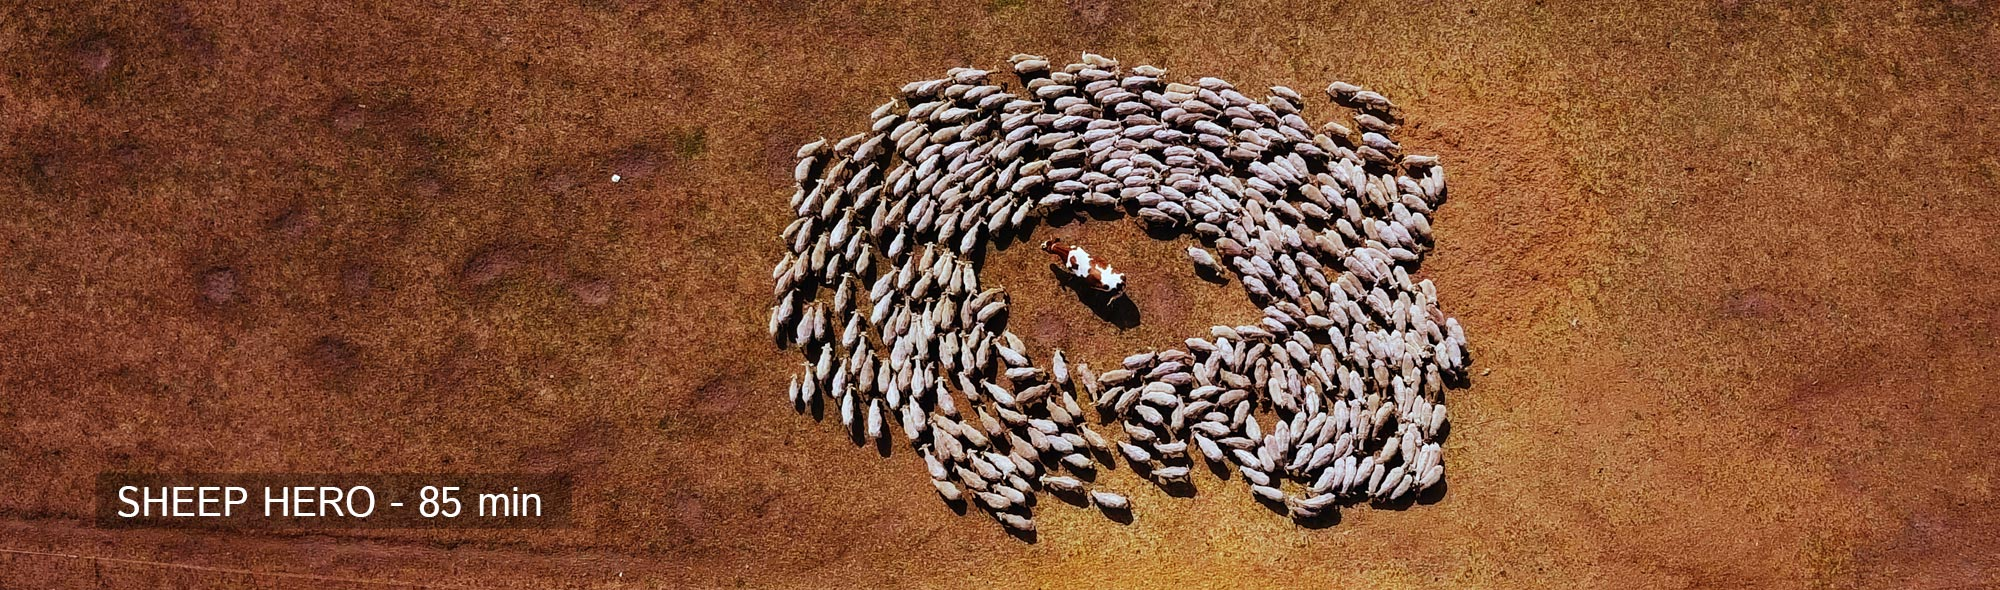 sheephero-scheep-cow